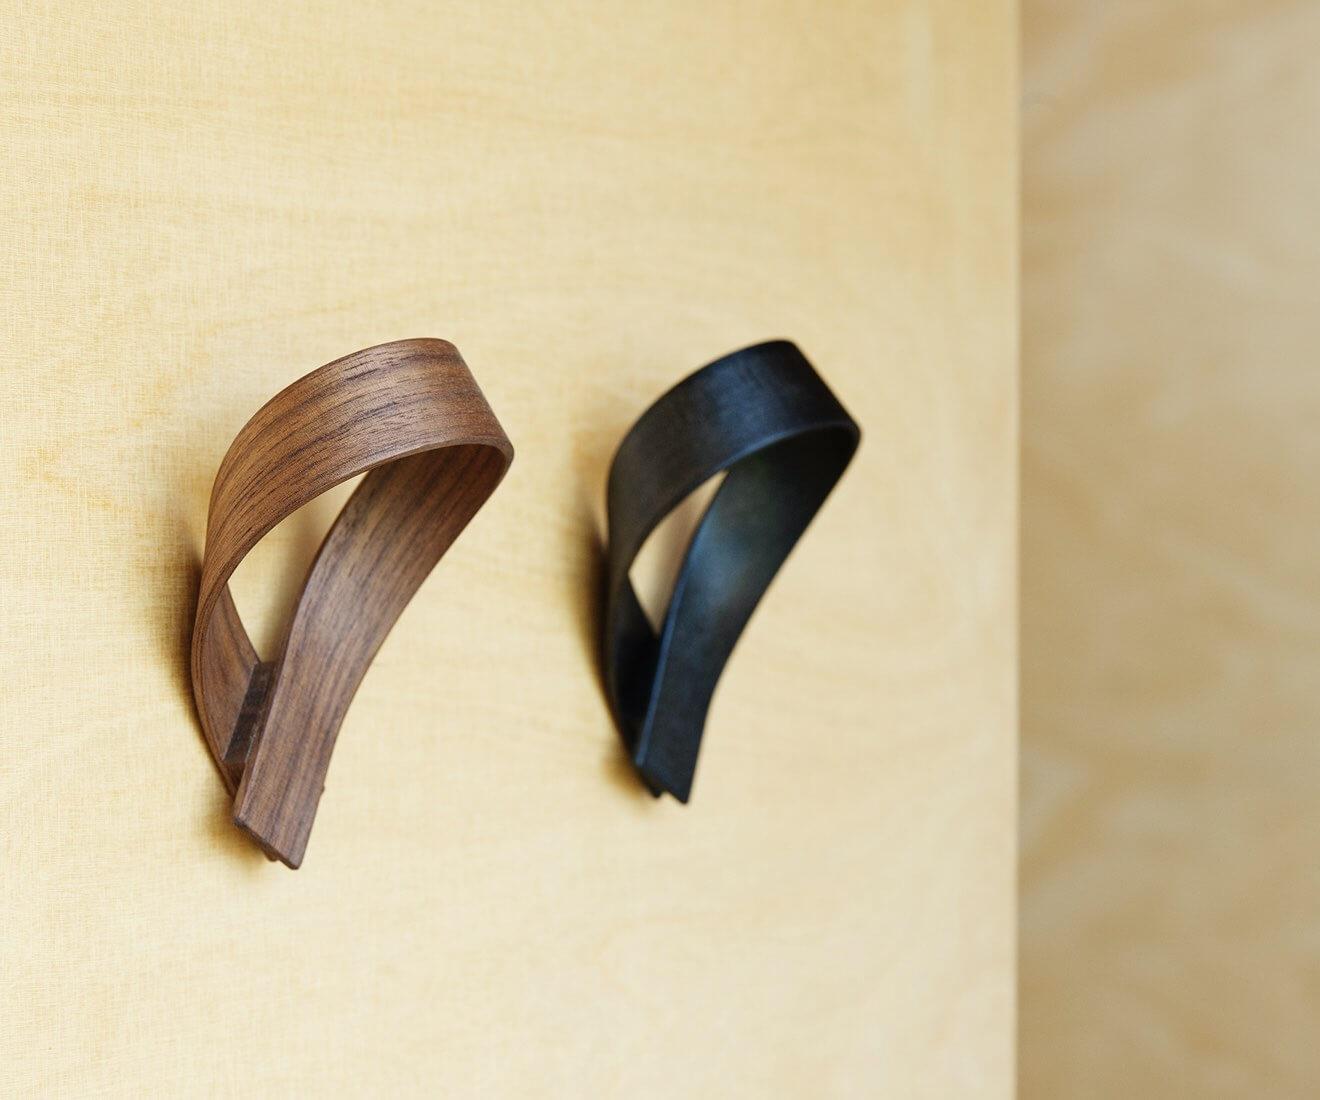 Interior photo of Motarasu designs - Ribbon coat hooks, walnut and black, by Akiko Ken Made